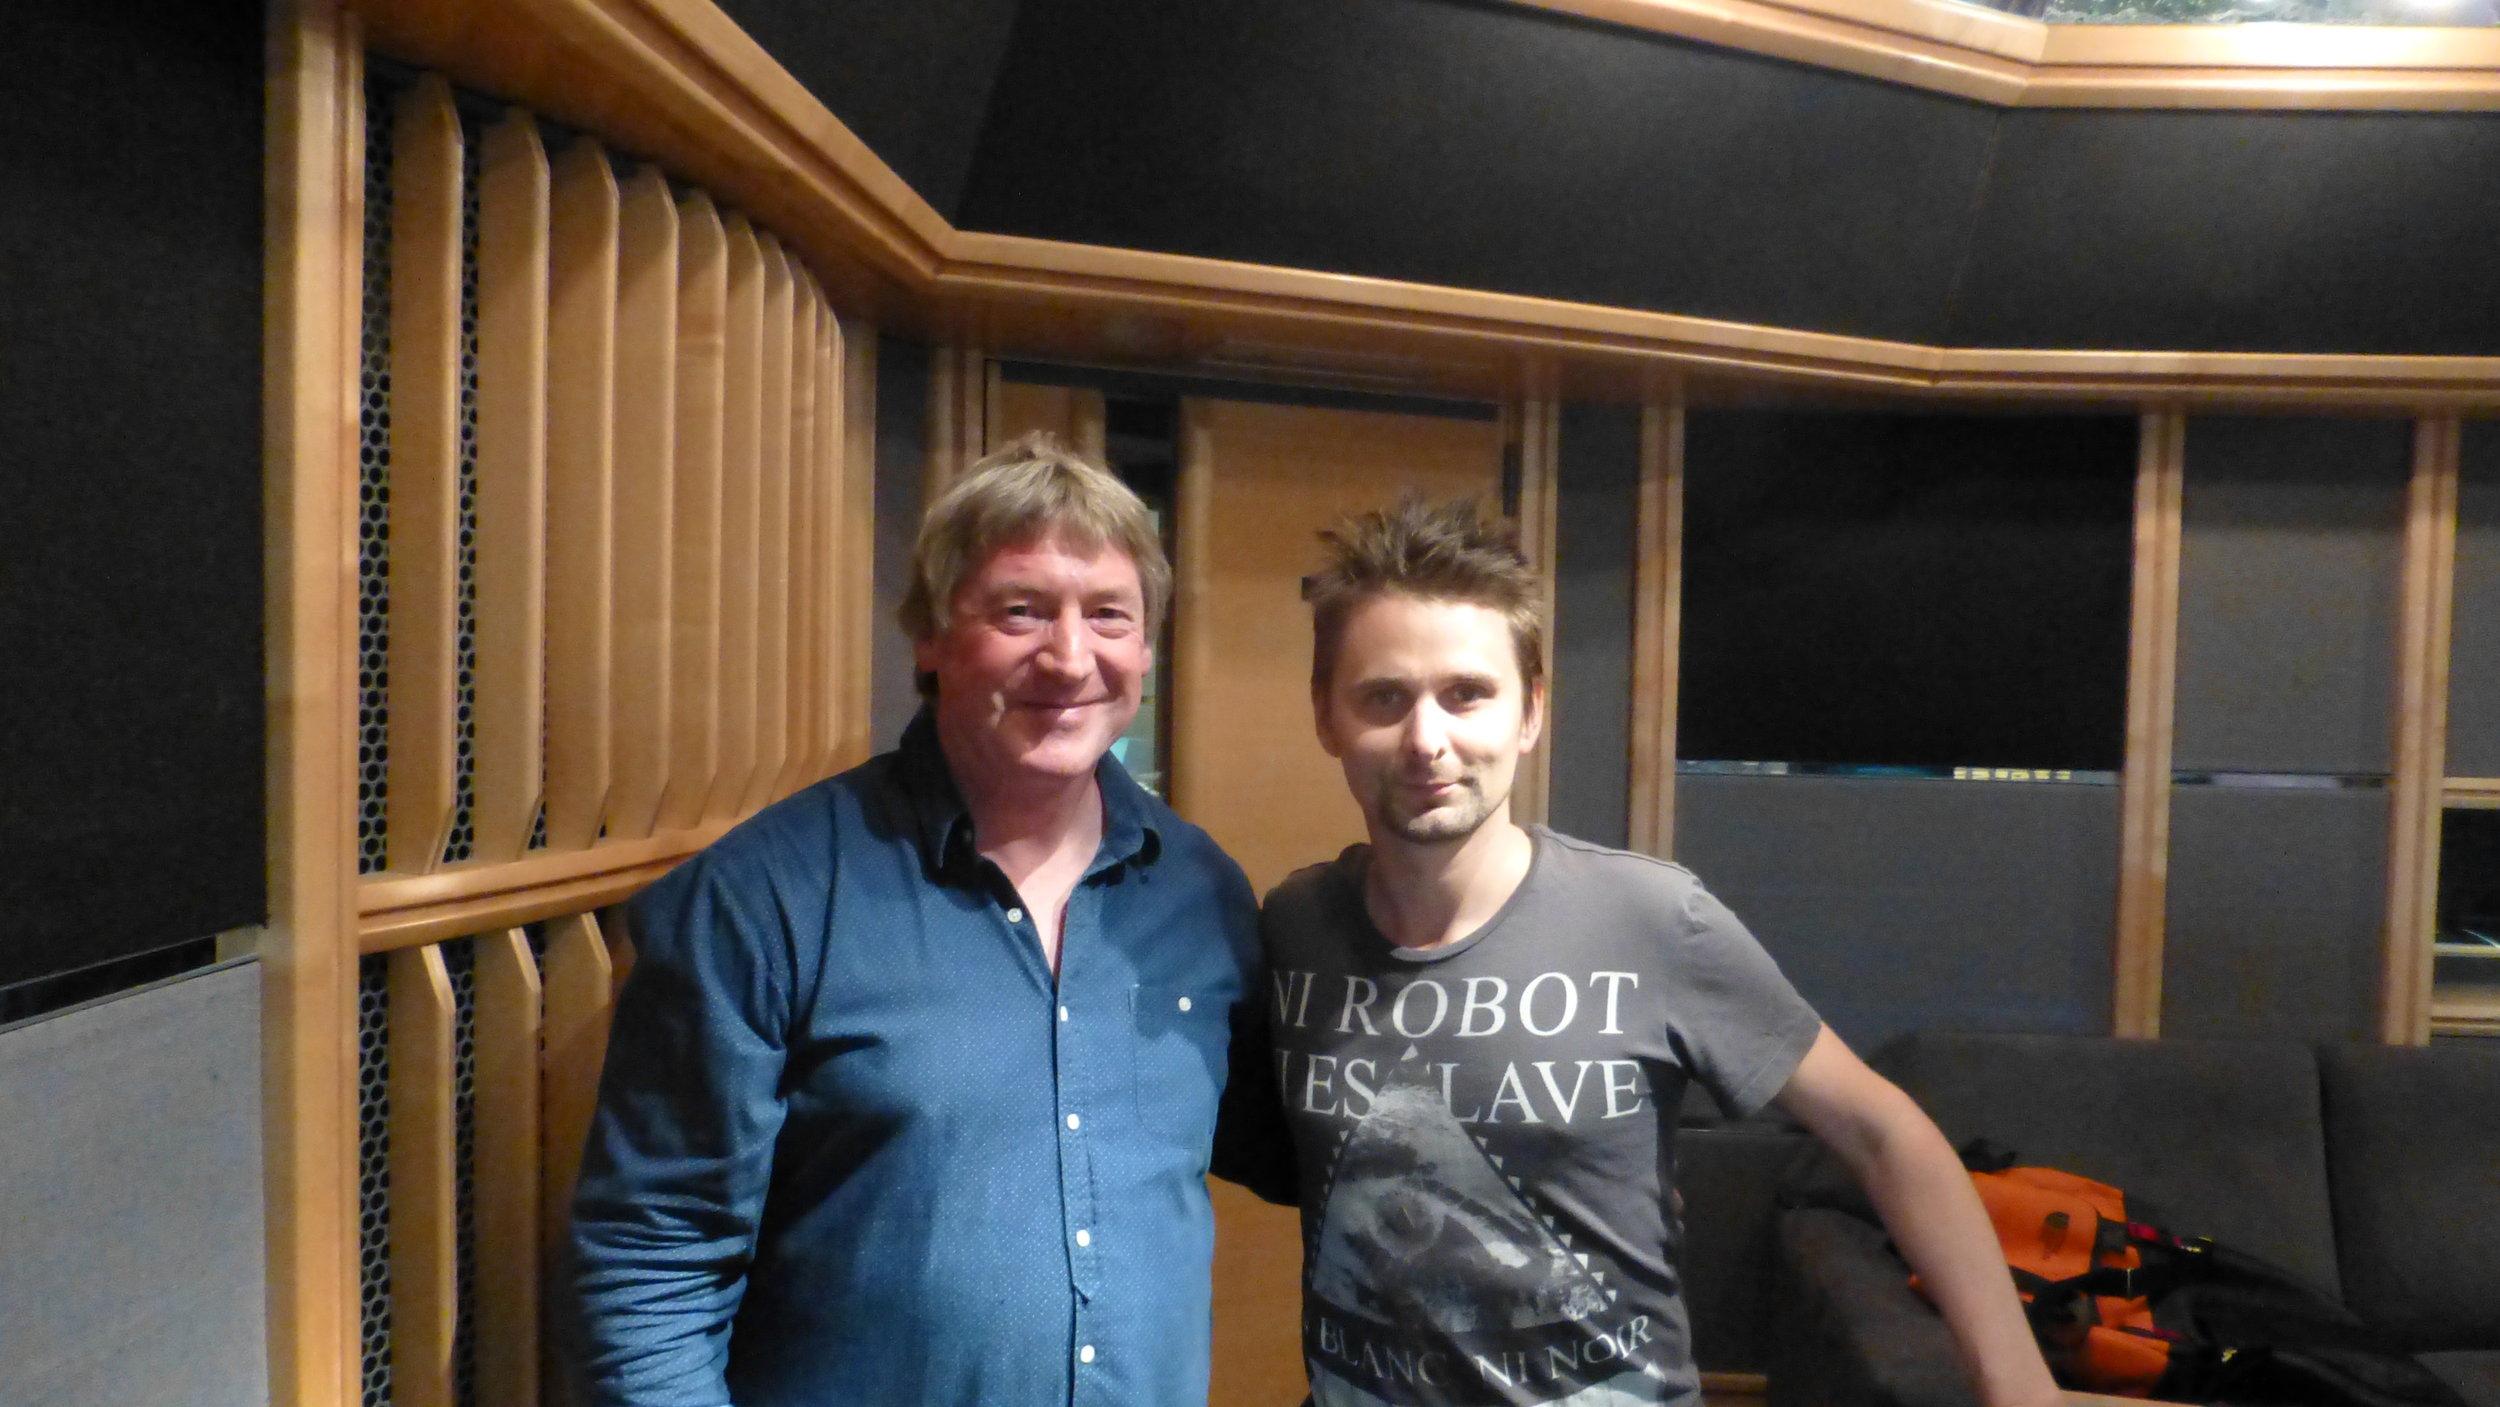 With Matt Bellamy (MUSE)